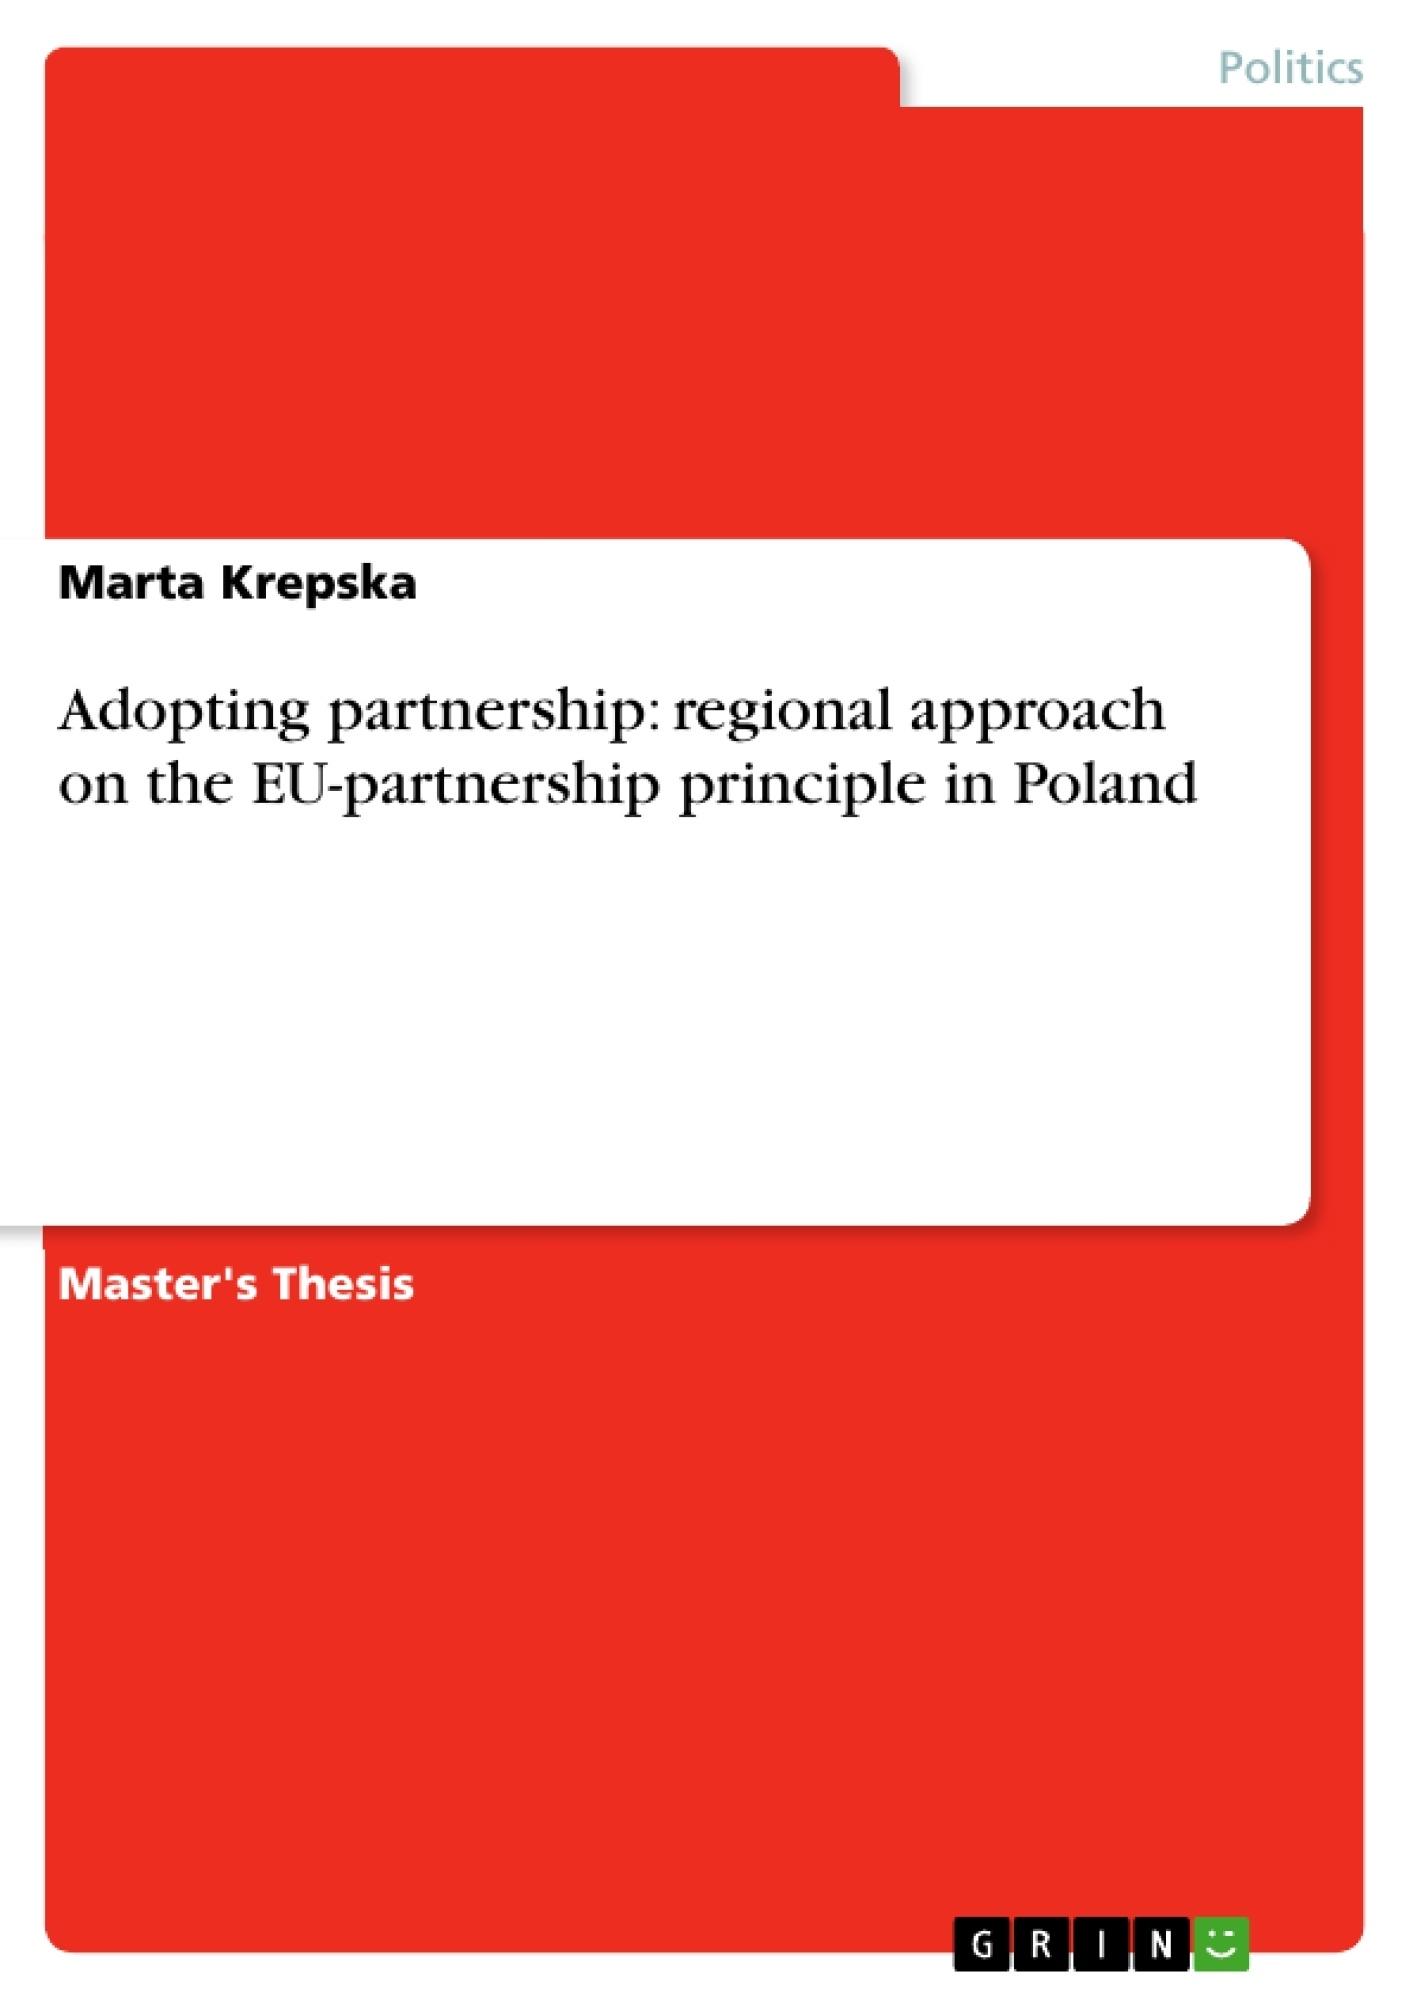 Title: Adopting partnership: regional approach on the  EU-partnership principle in Poland